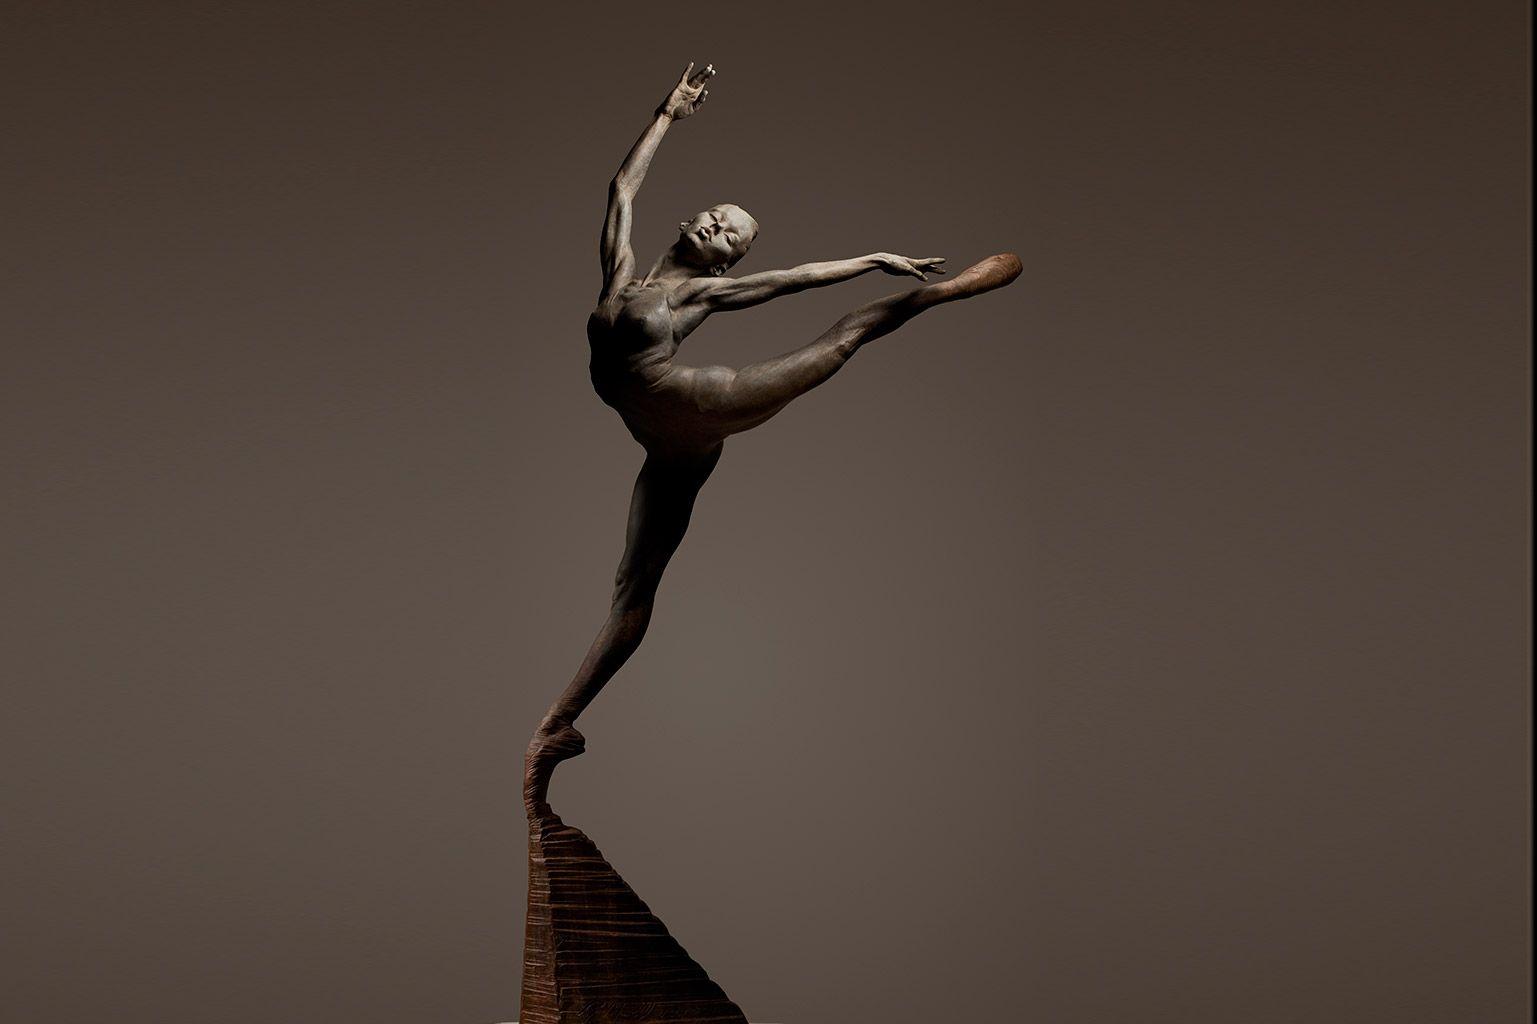 Richard MacDonald - Sissone / Off the Wall Gallery